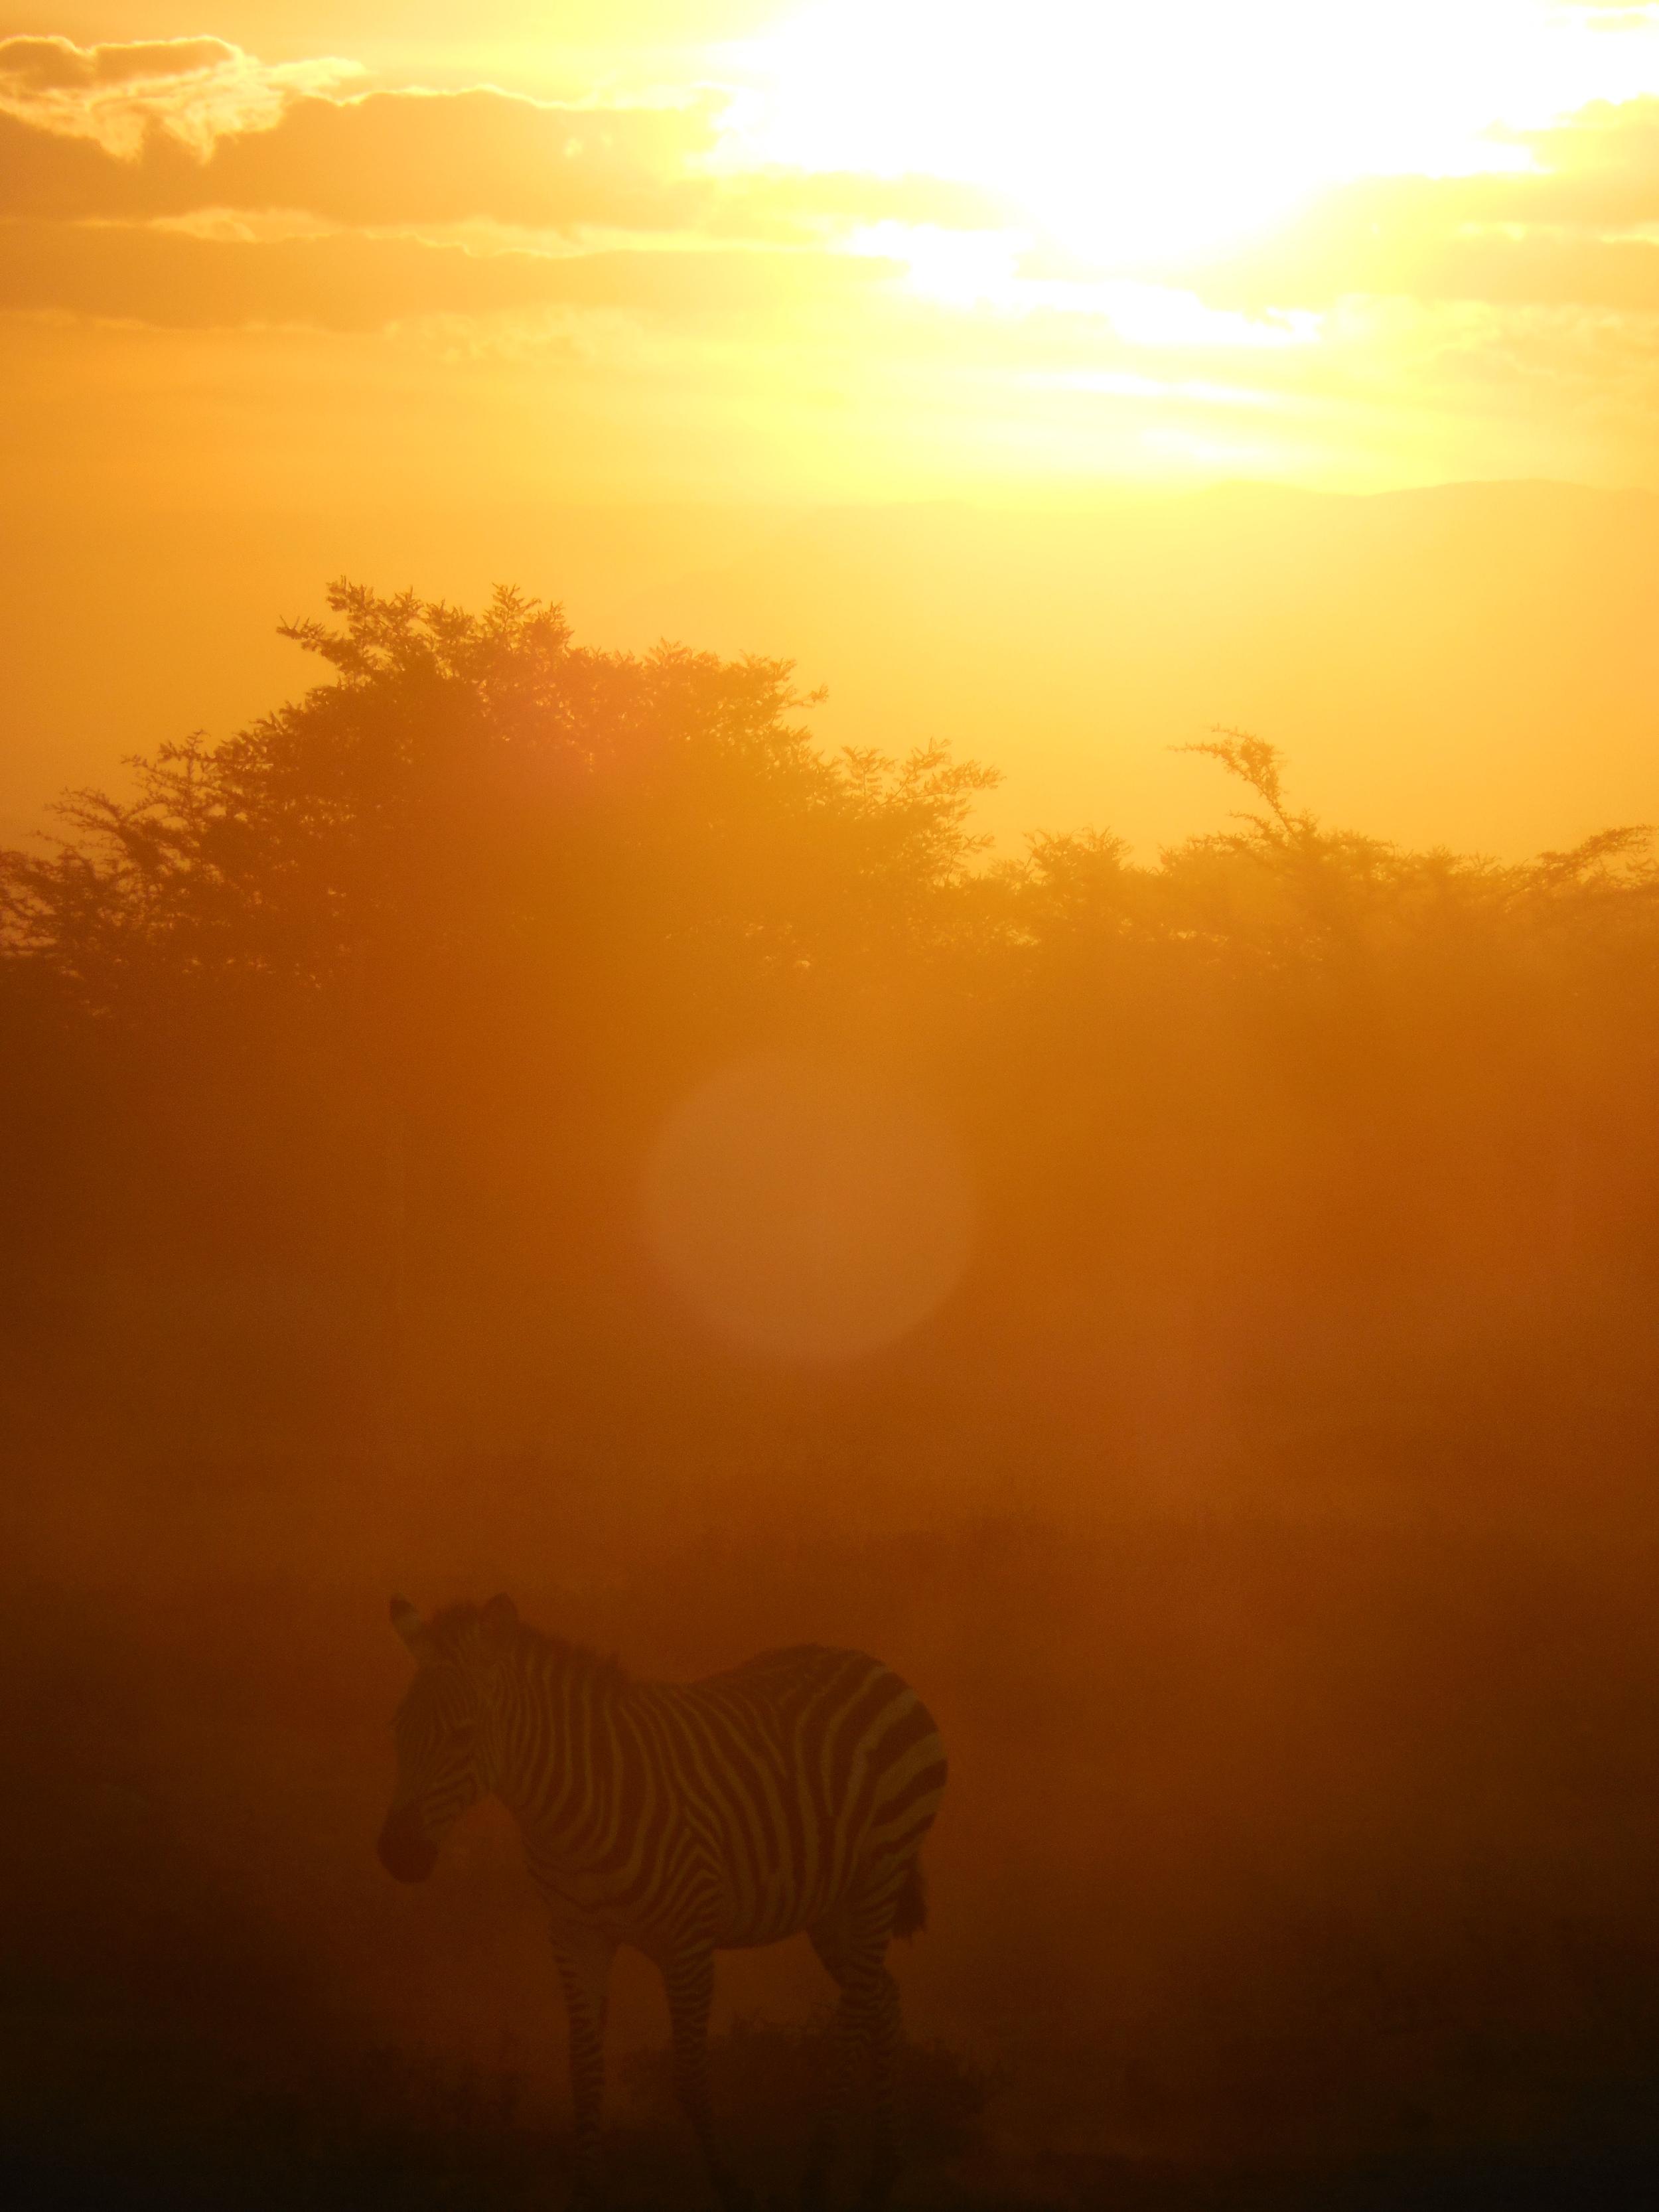 Zebra at Sunset, Amboseli National Park, Kenya 2014 © Flyga Twiga LLC     Member ID: 14-3-1090-5CH